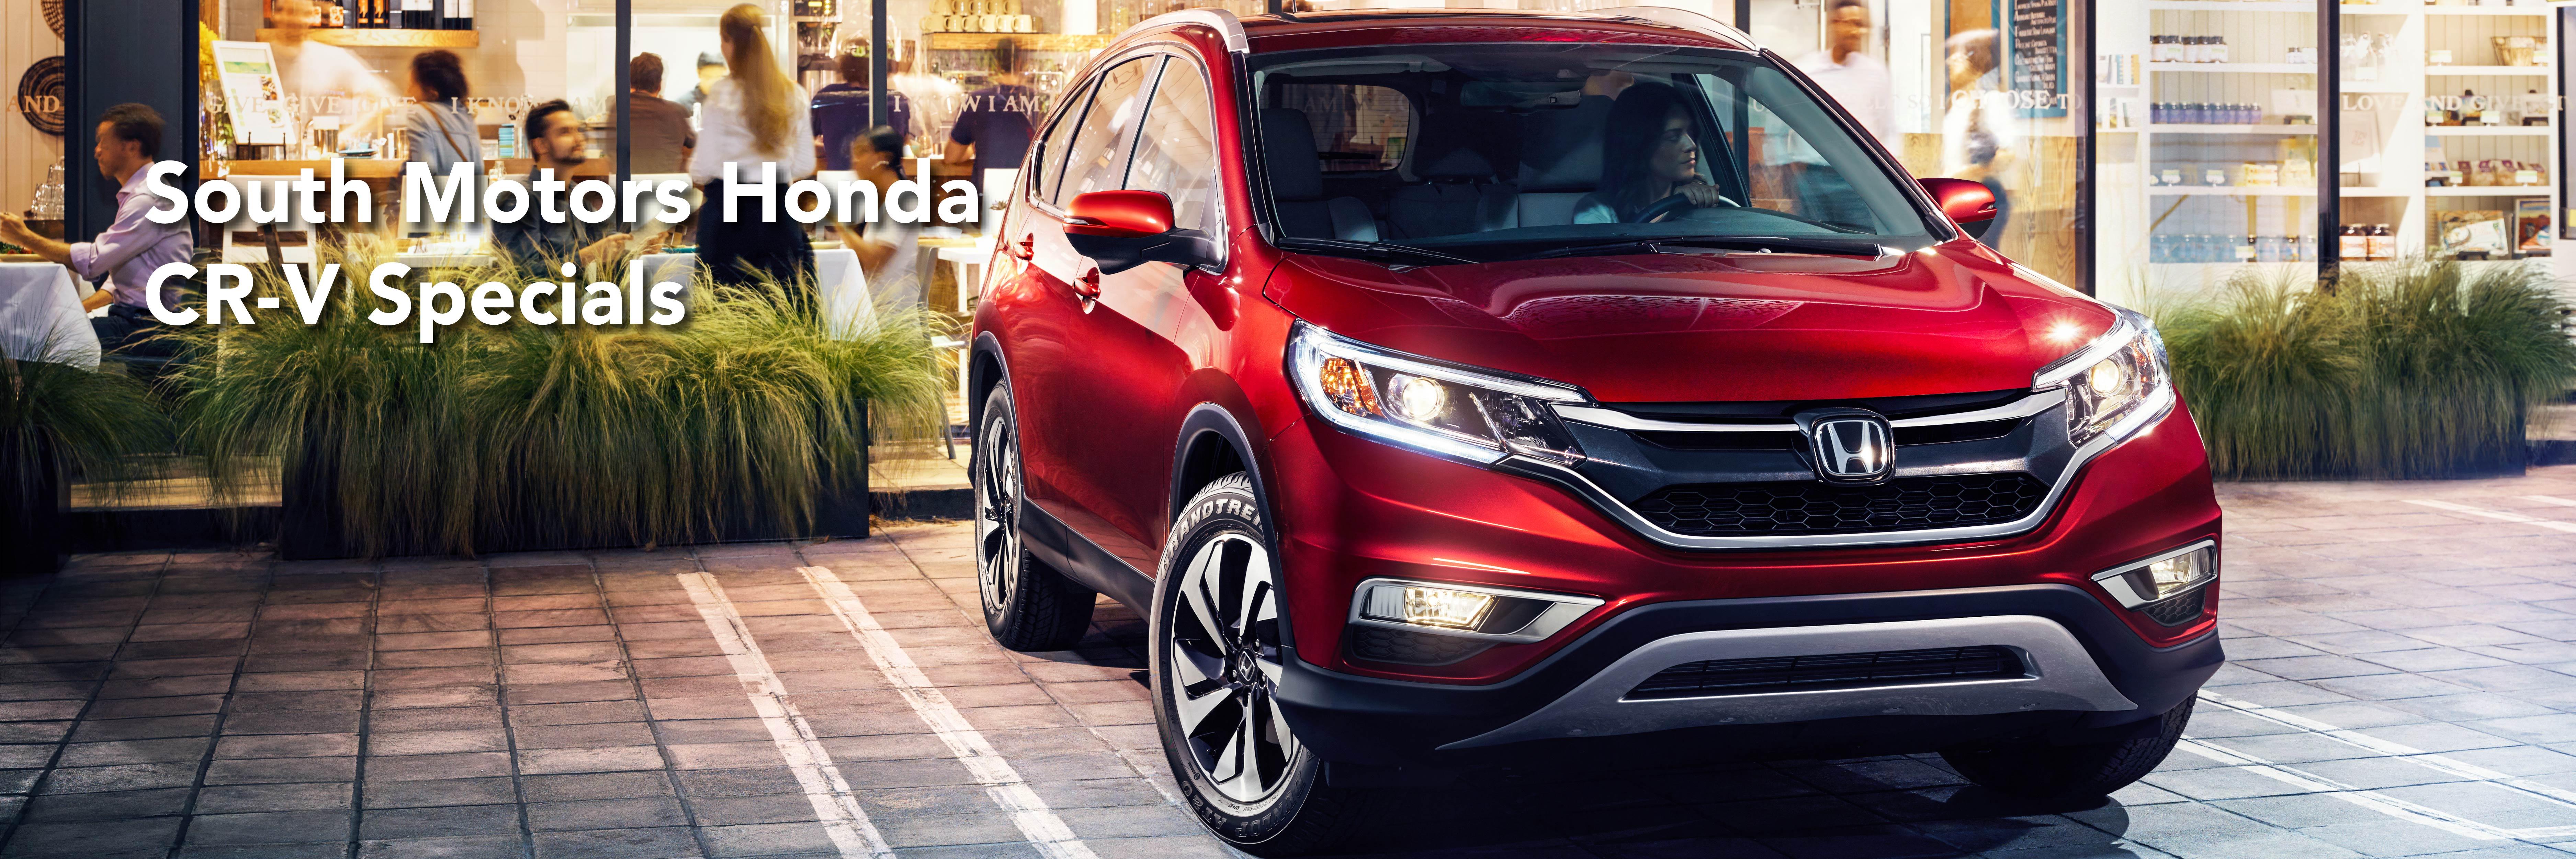 Honda crv for South motors honda miami